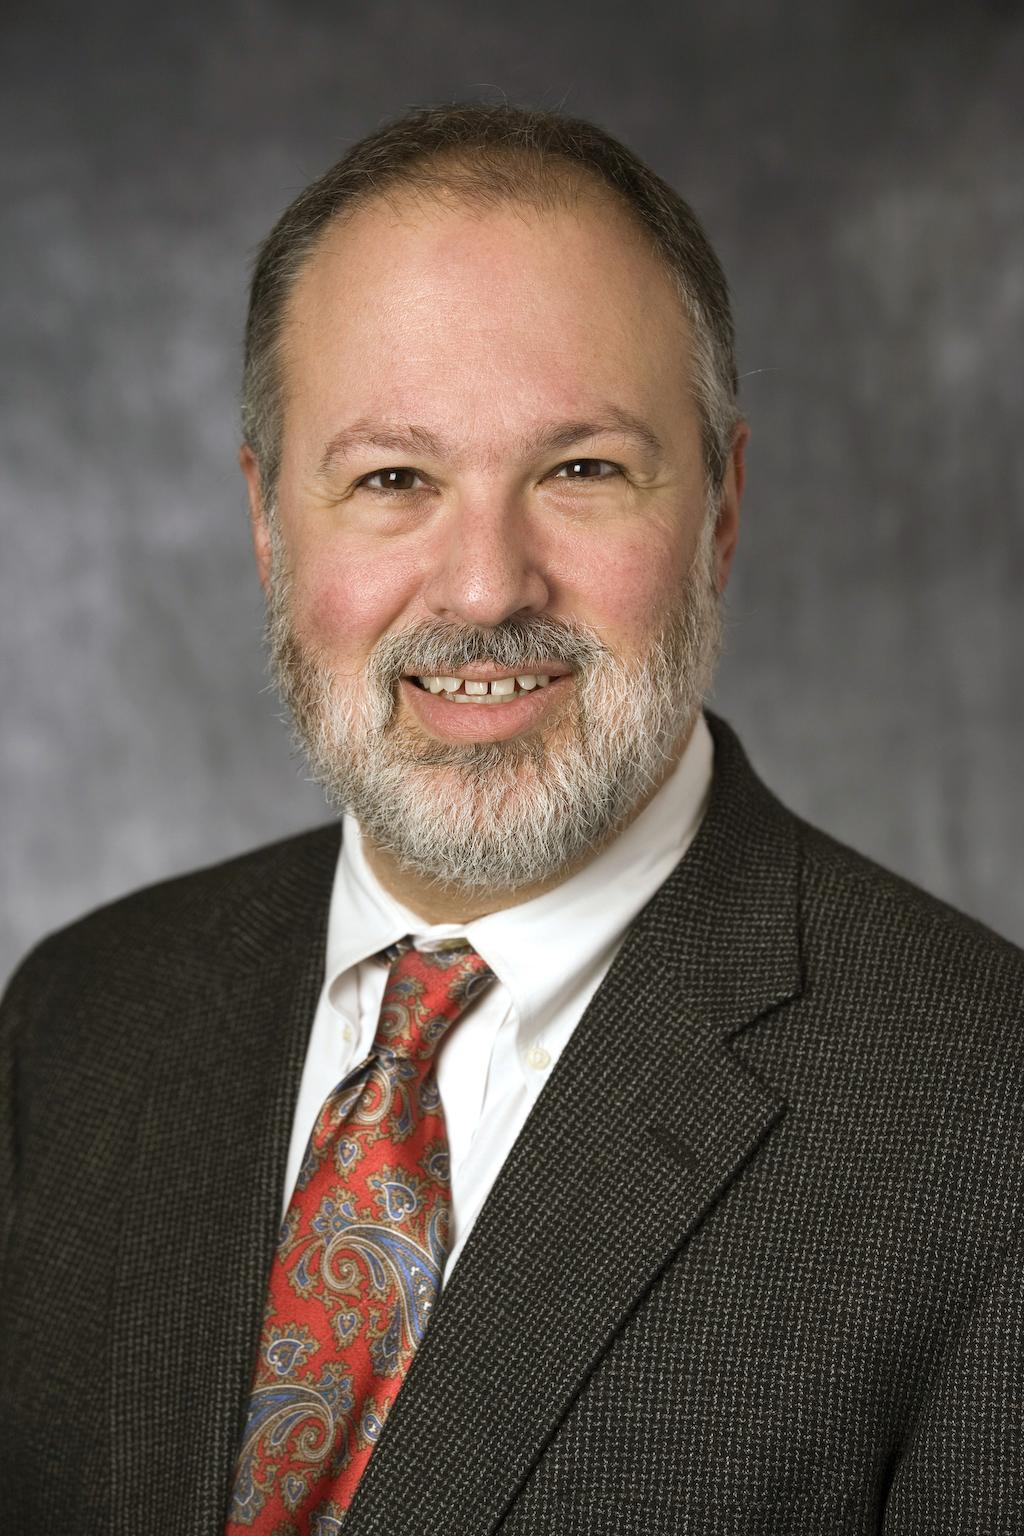 Robert j. Ronis, MD, MPH